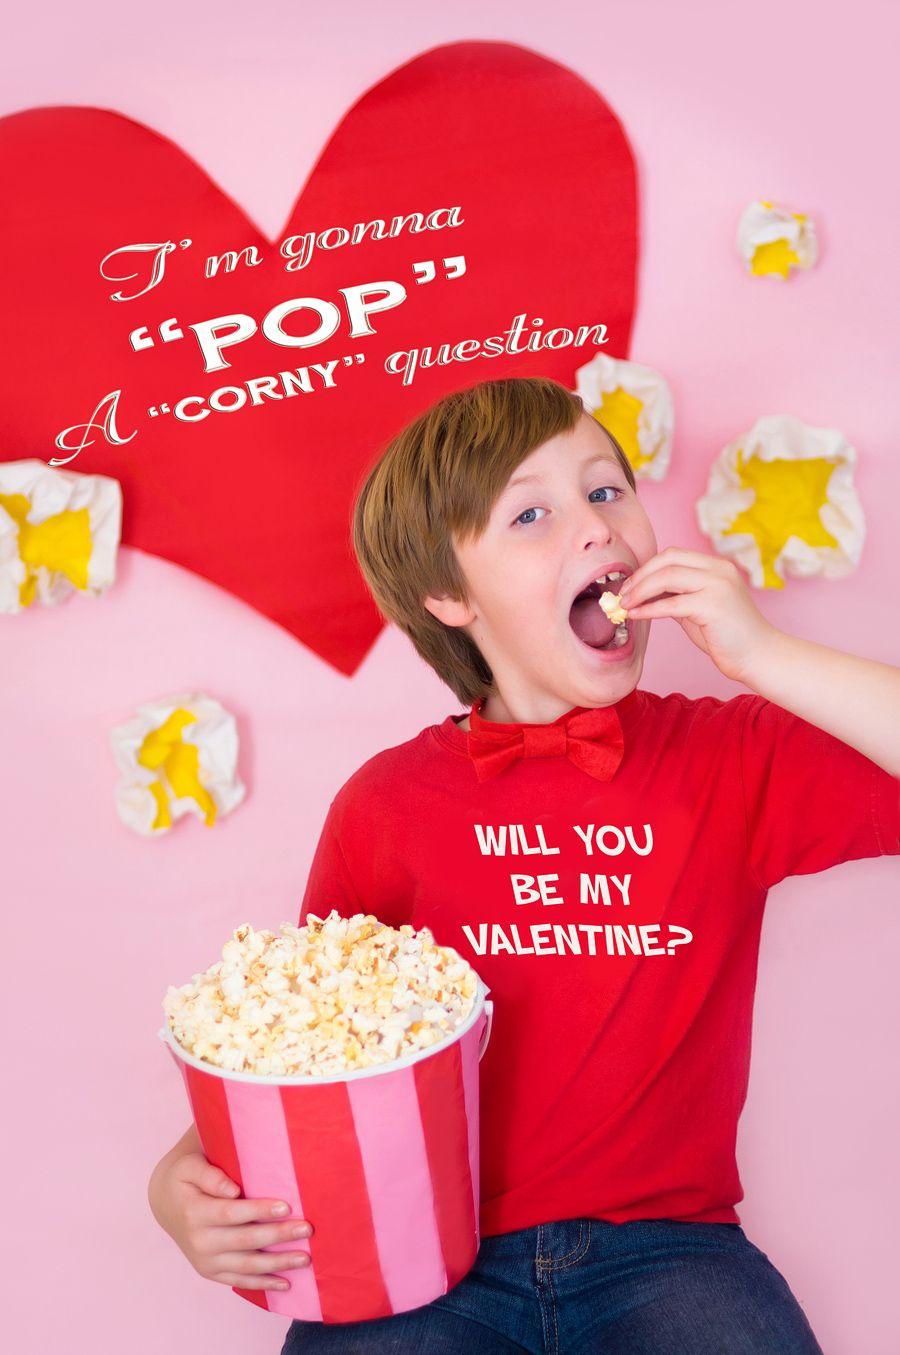 Valentine's Day | Photoshoot ideas for Valentine's DIY cards photos